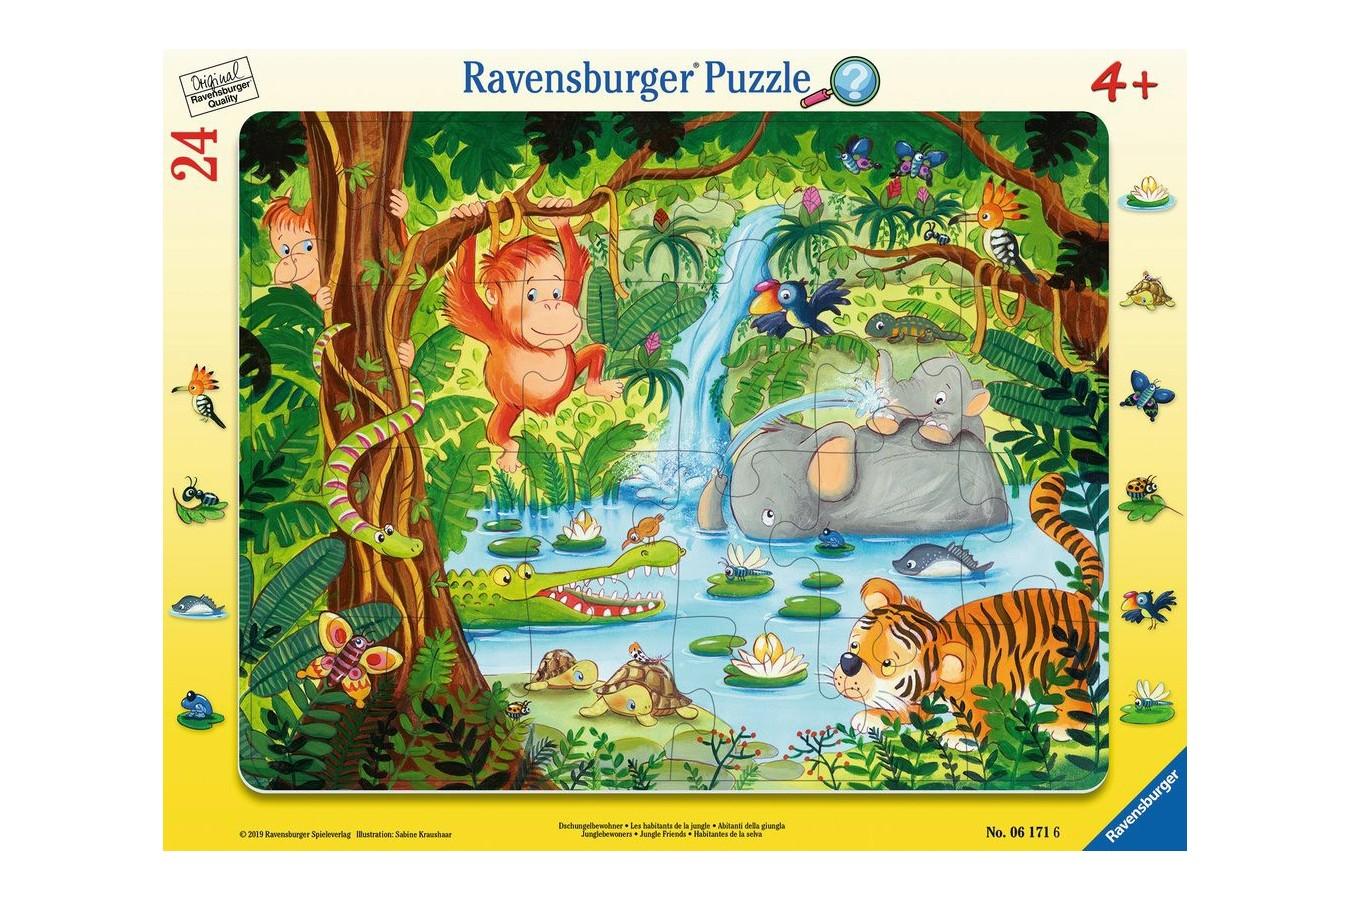 Puzzle Ravensburger - Jungle, 24 piese (06171) imagine